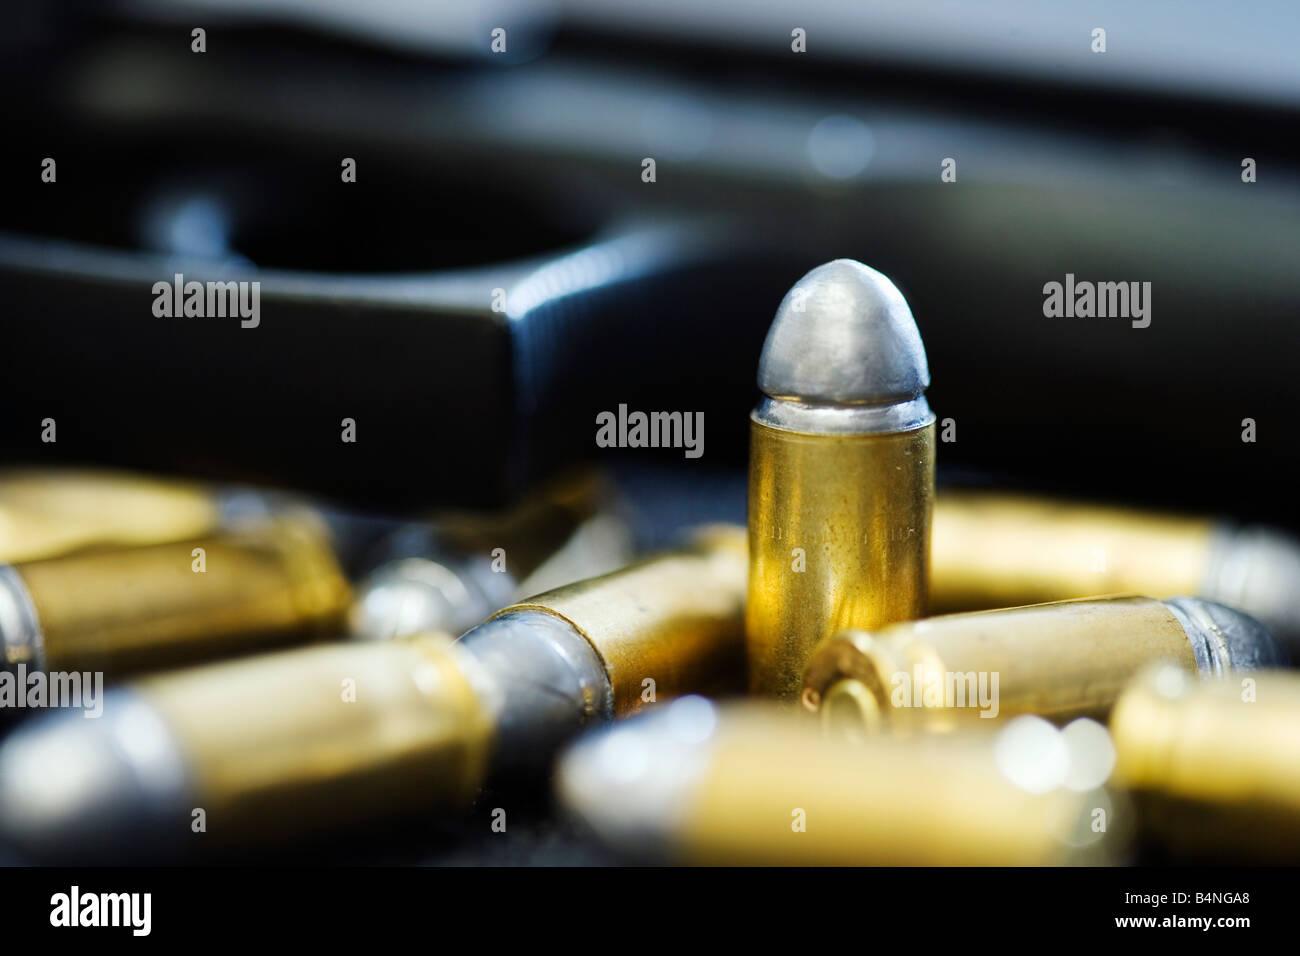 Close up of Beretta 92F handgun with 9mm ammunition - Stock Image